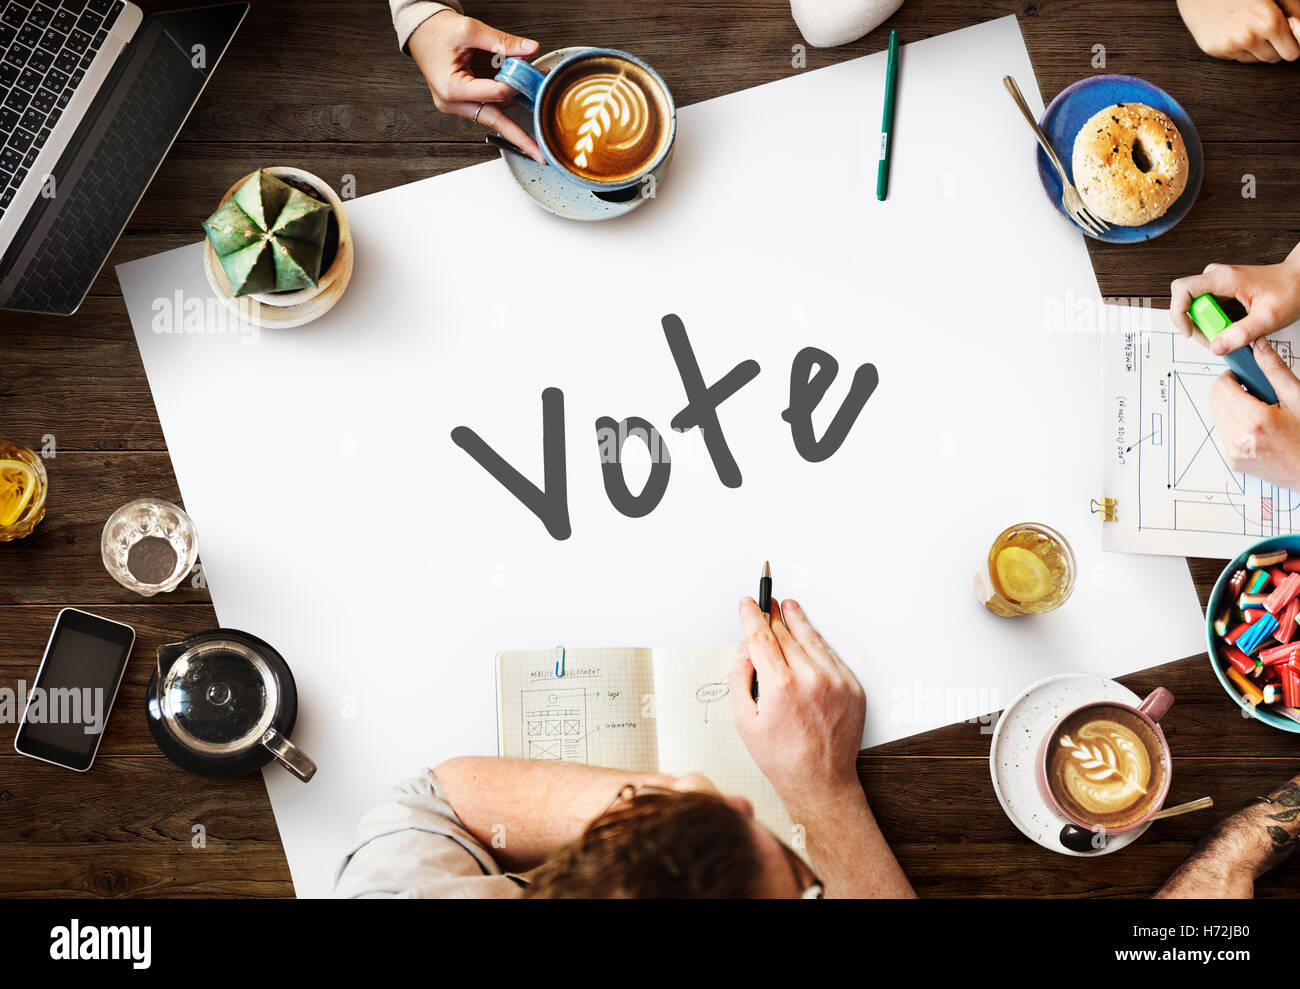 Vote Today Election Politics Concept - Stock Image